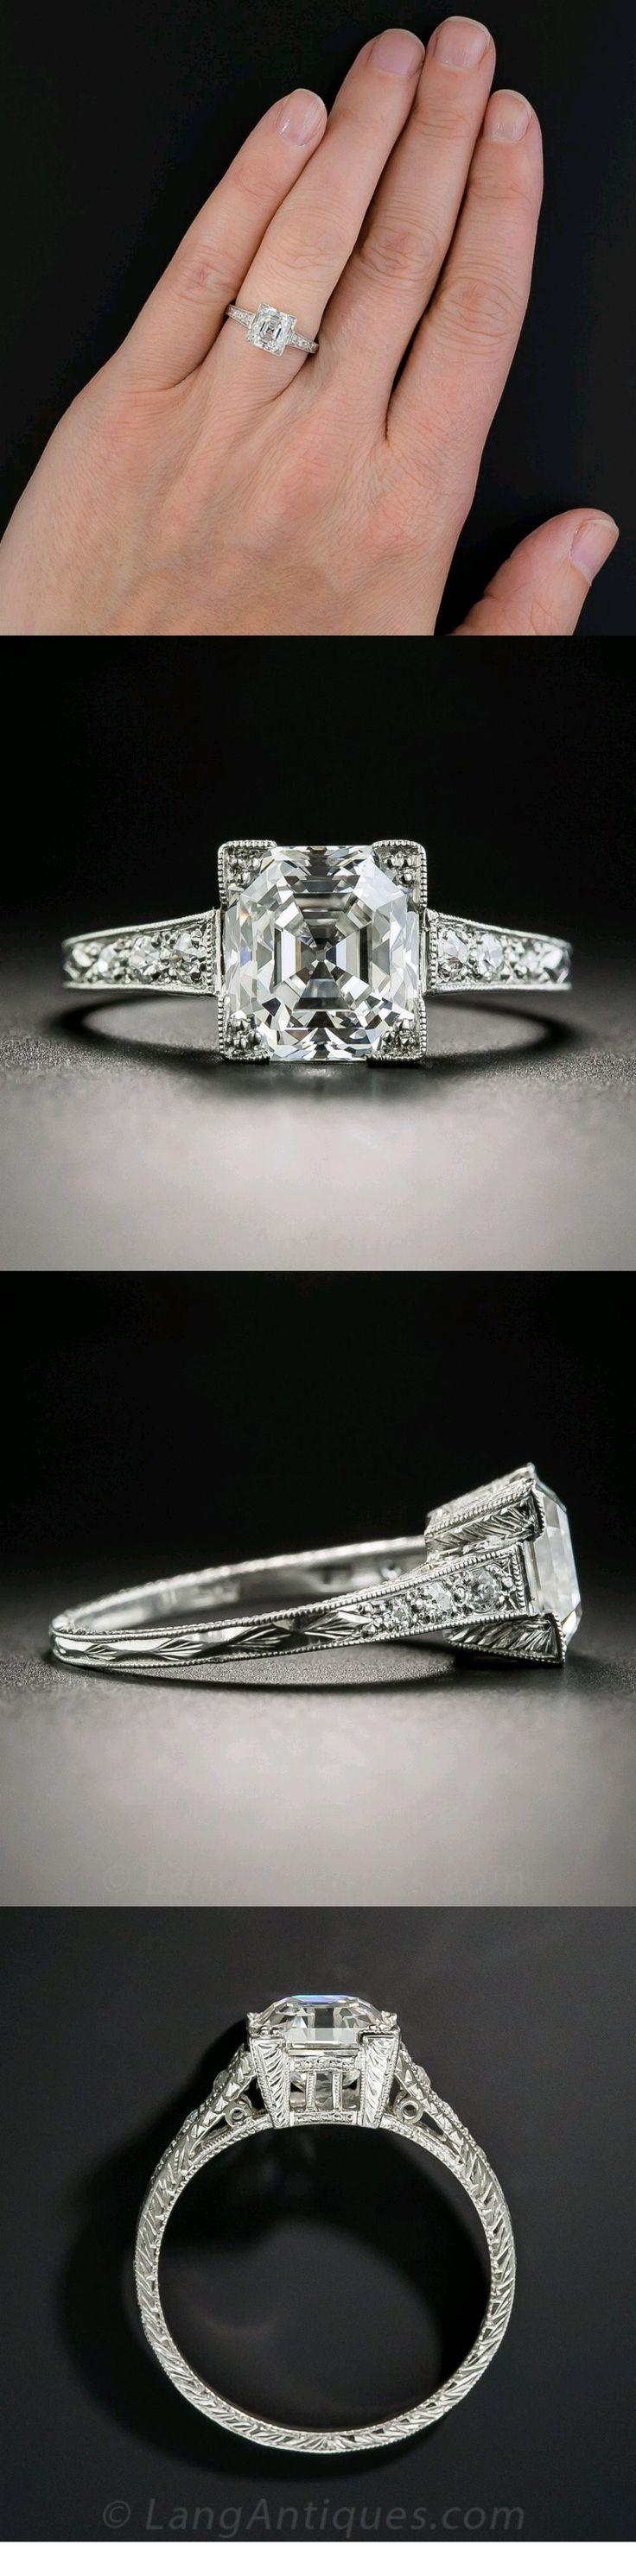 Die besten 25 Asscher cut diamond ring Ideen auf Pinterest